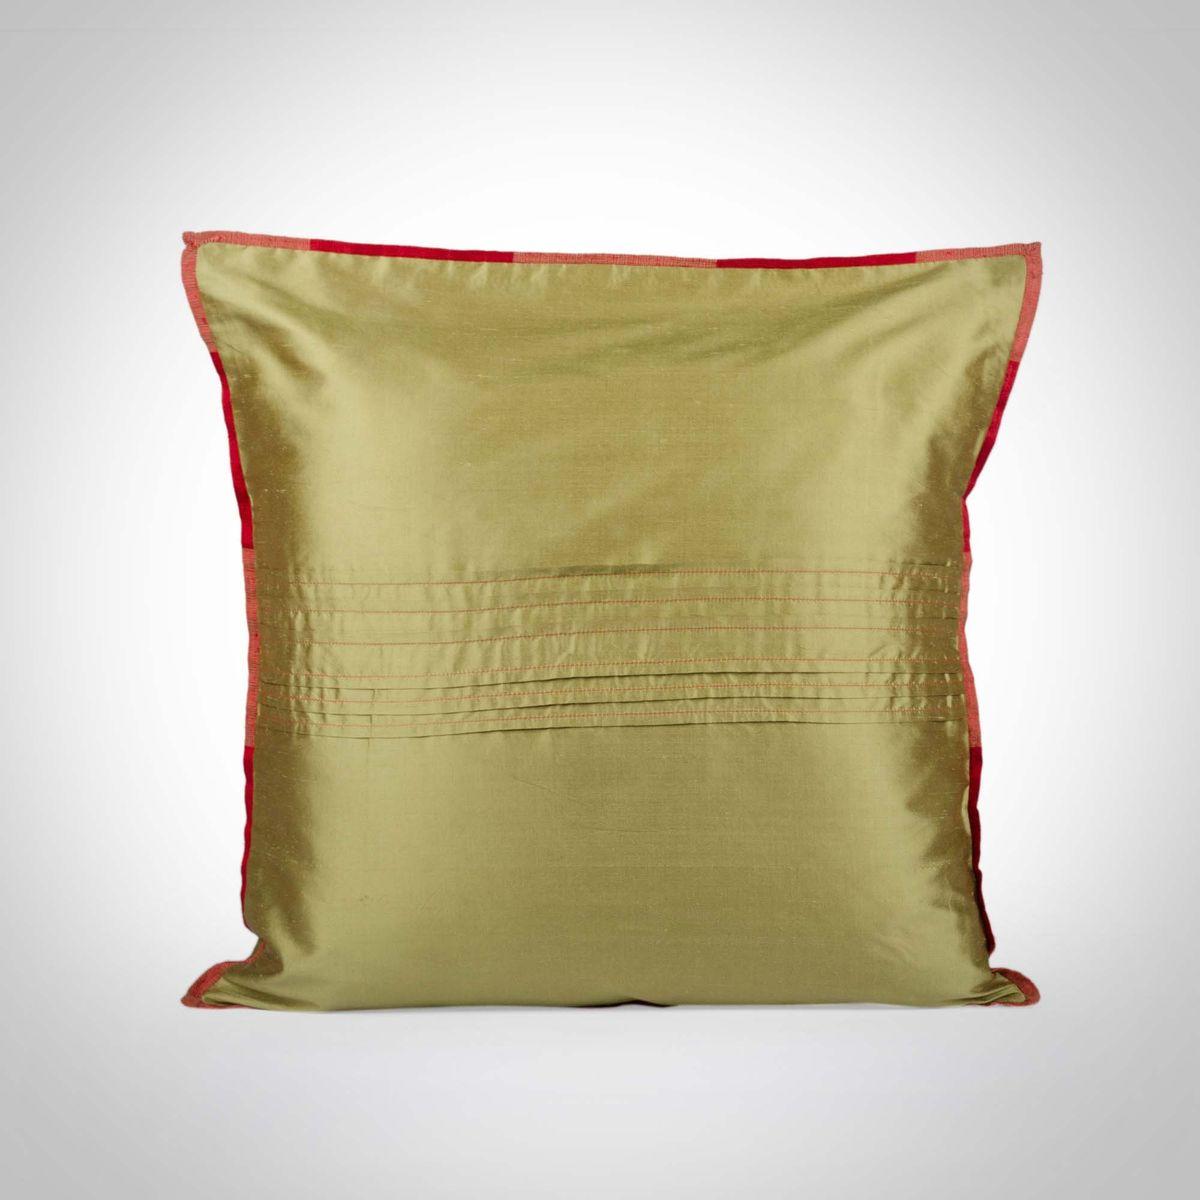 Kachi kairi offset Pink Cushion Cover - 16x16Inch